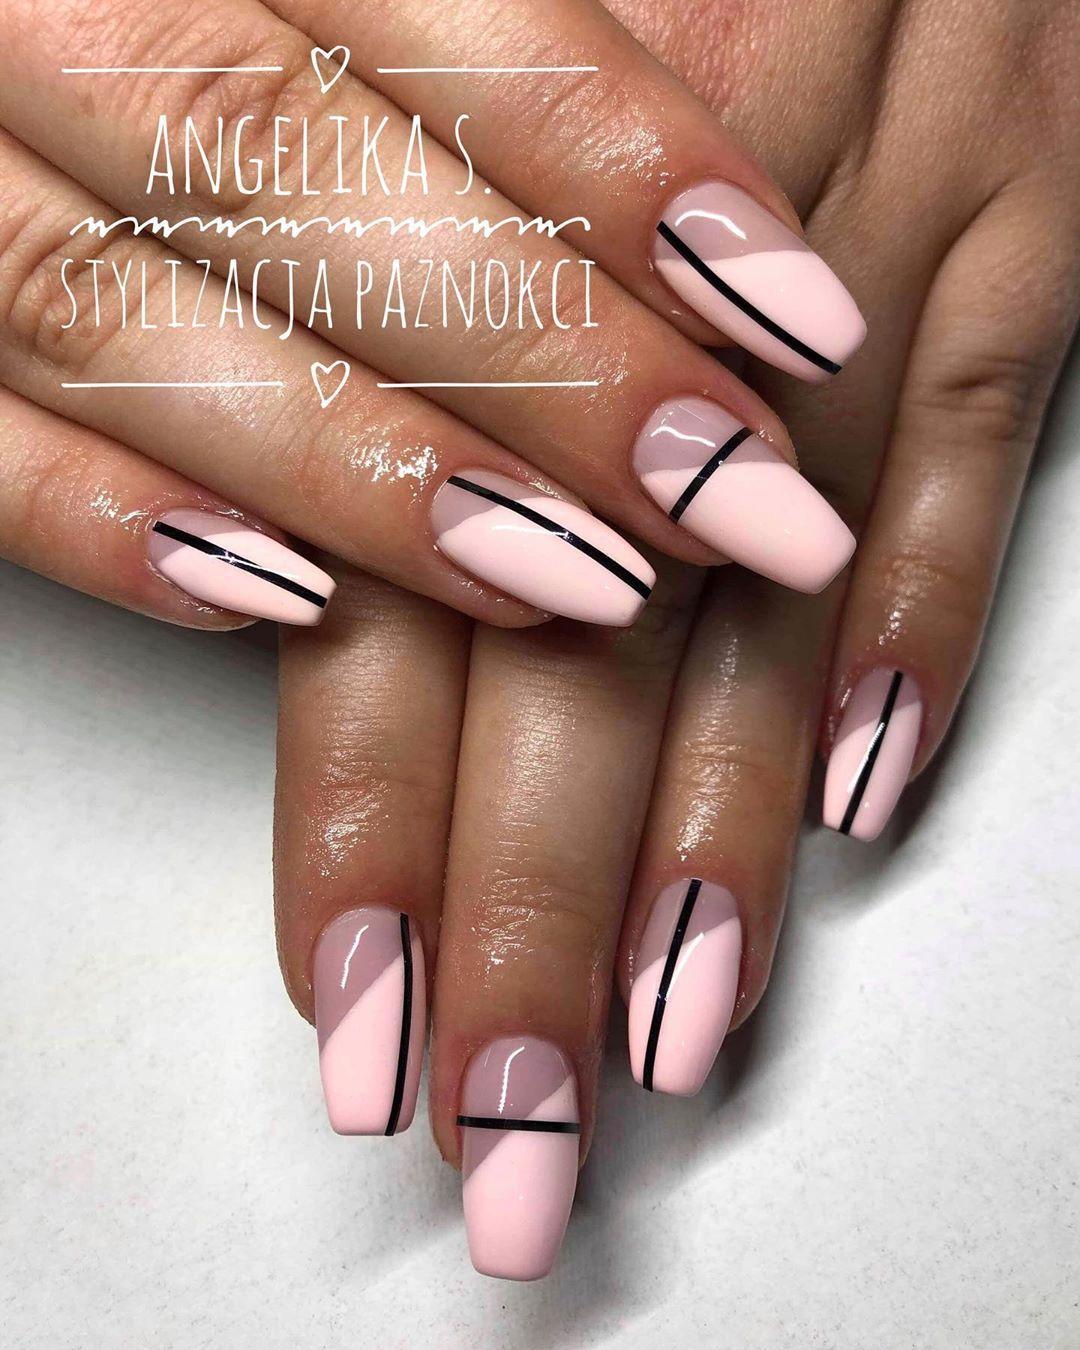 Angelika On Instagram Nails Nailove Nailstagram